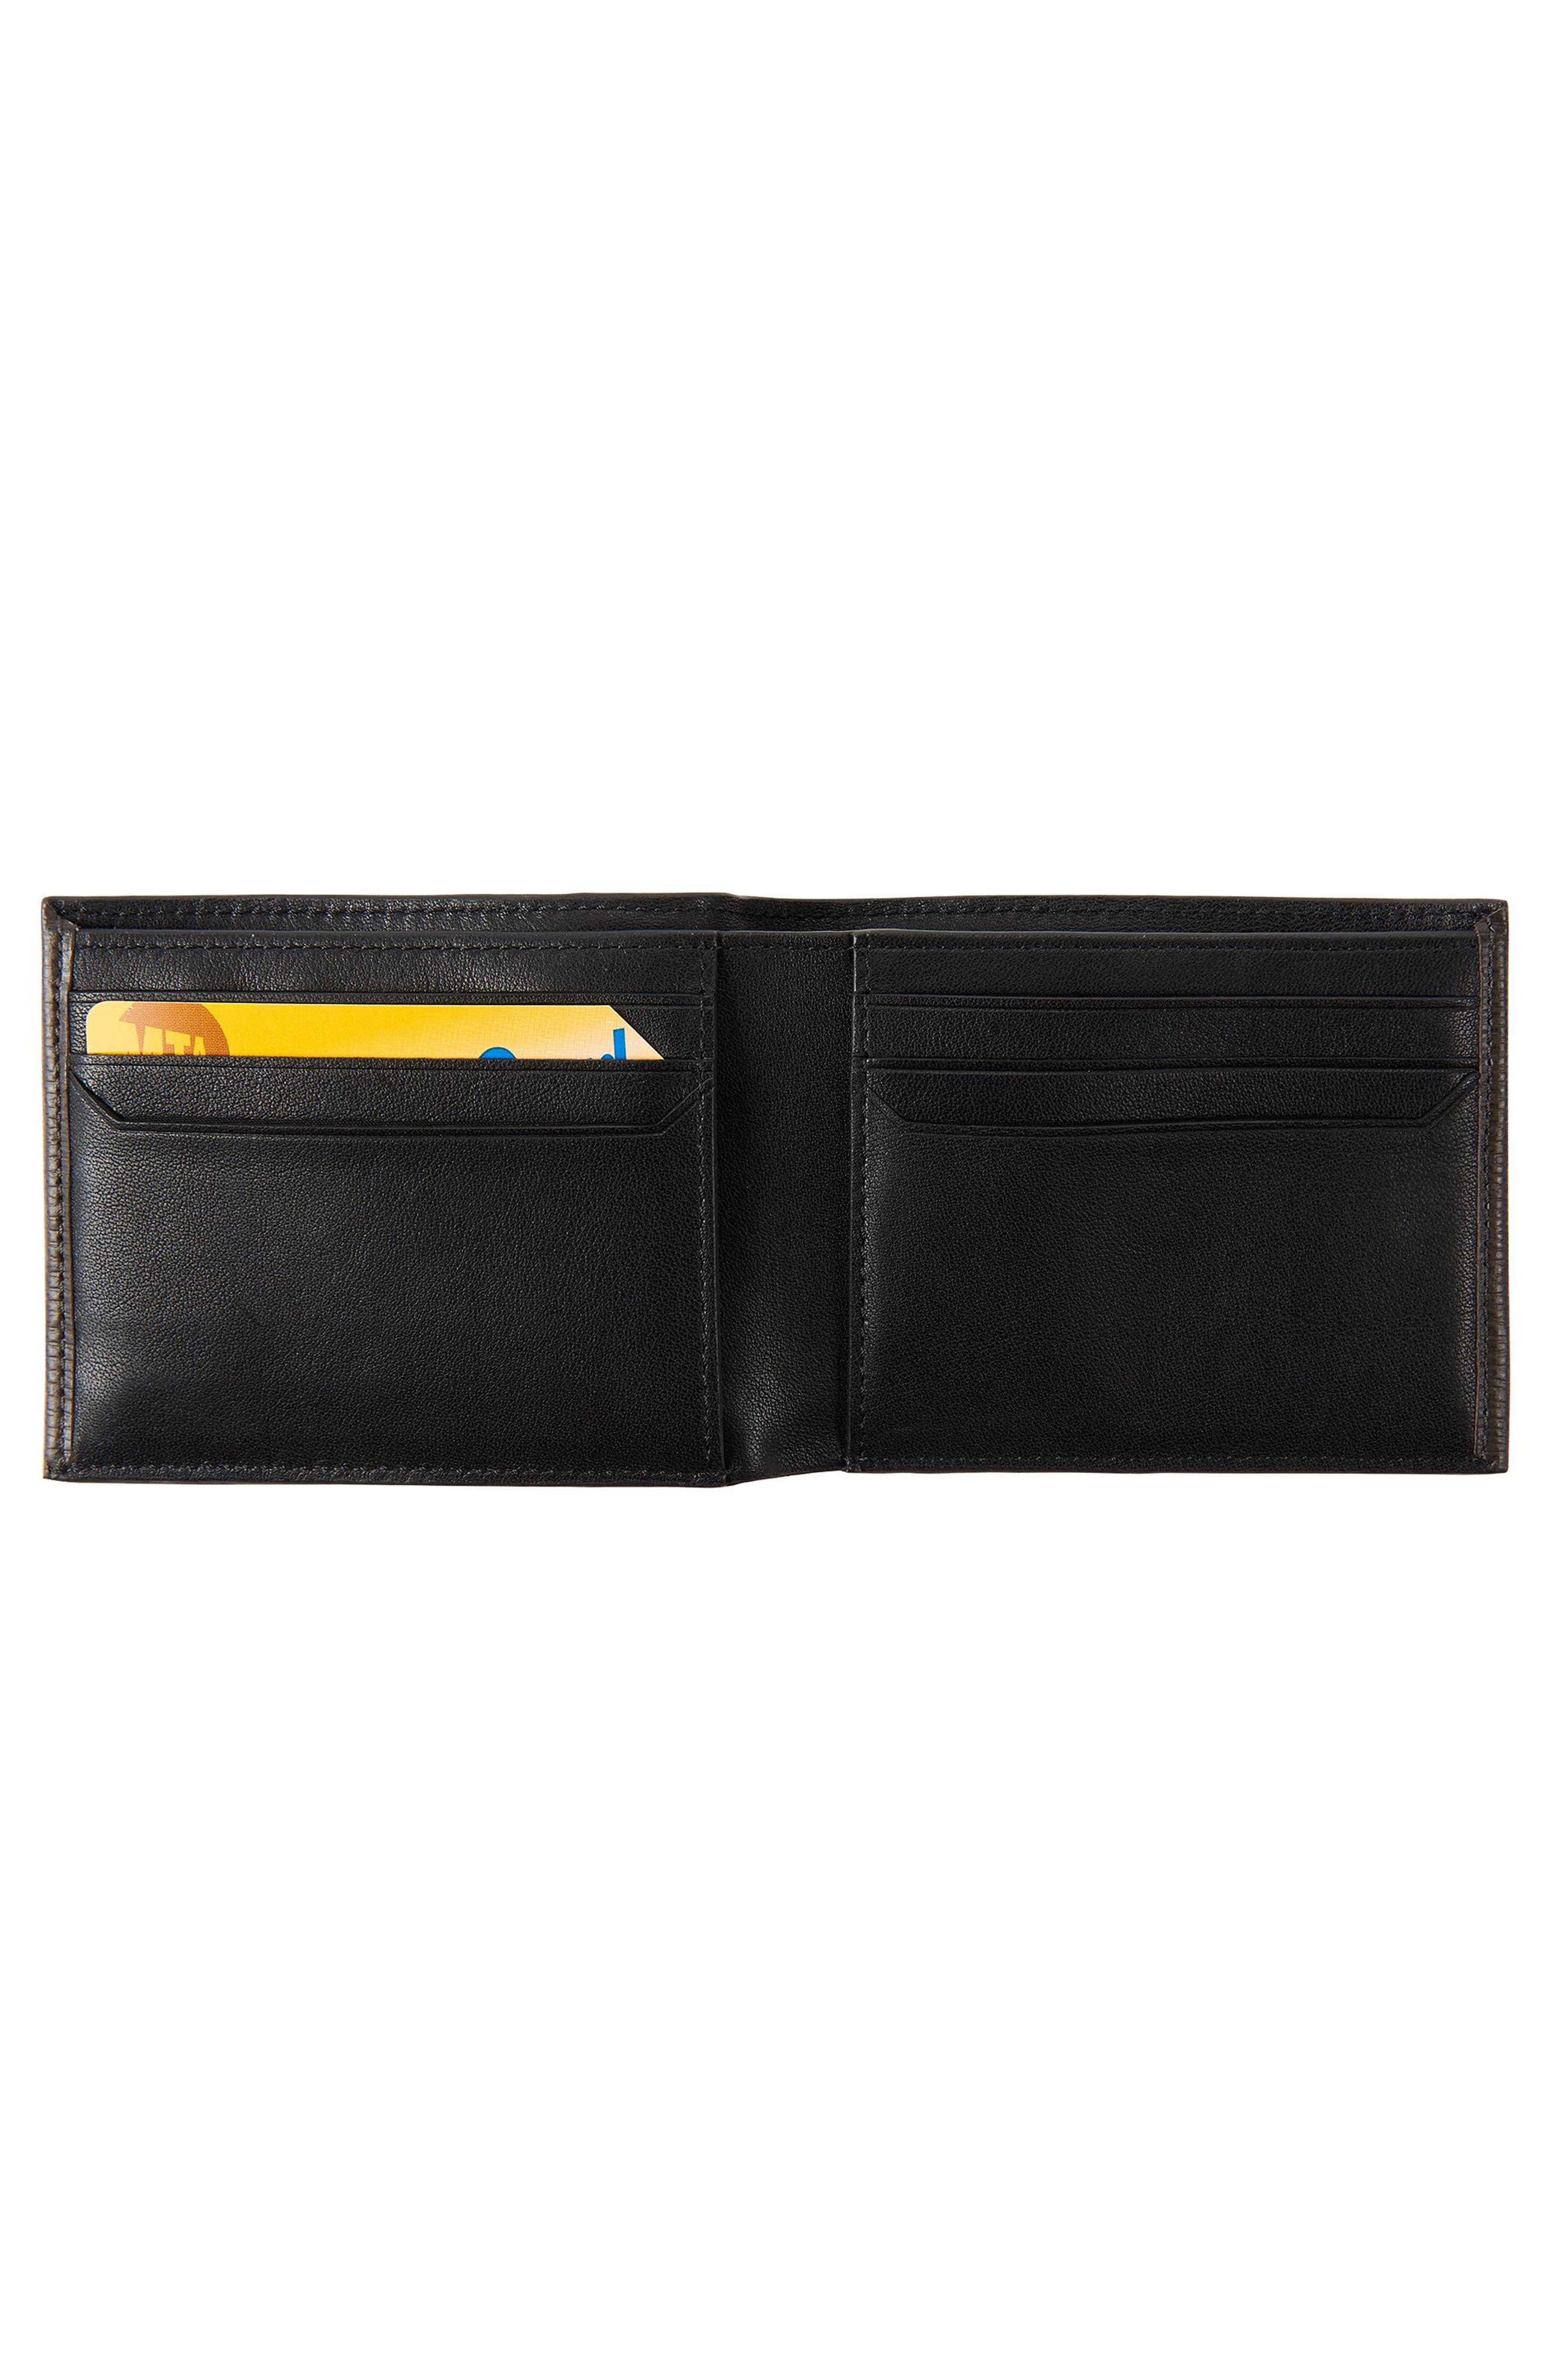 Monaco Leather Wallet,                             Alternate thumbnail 2, color,                             TAUPE